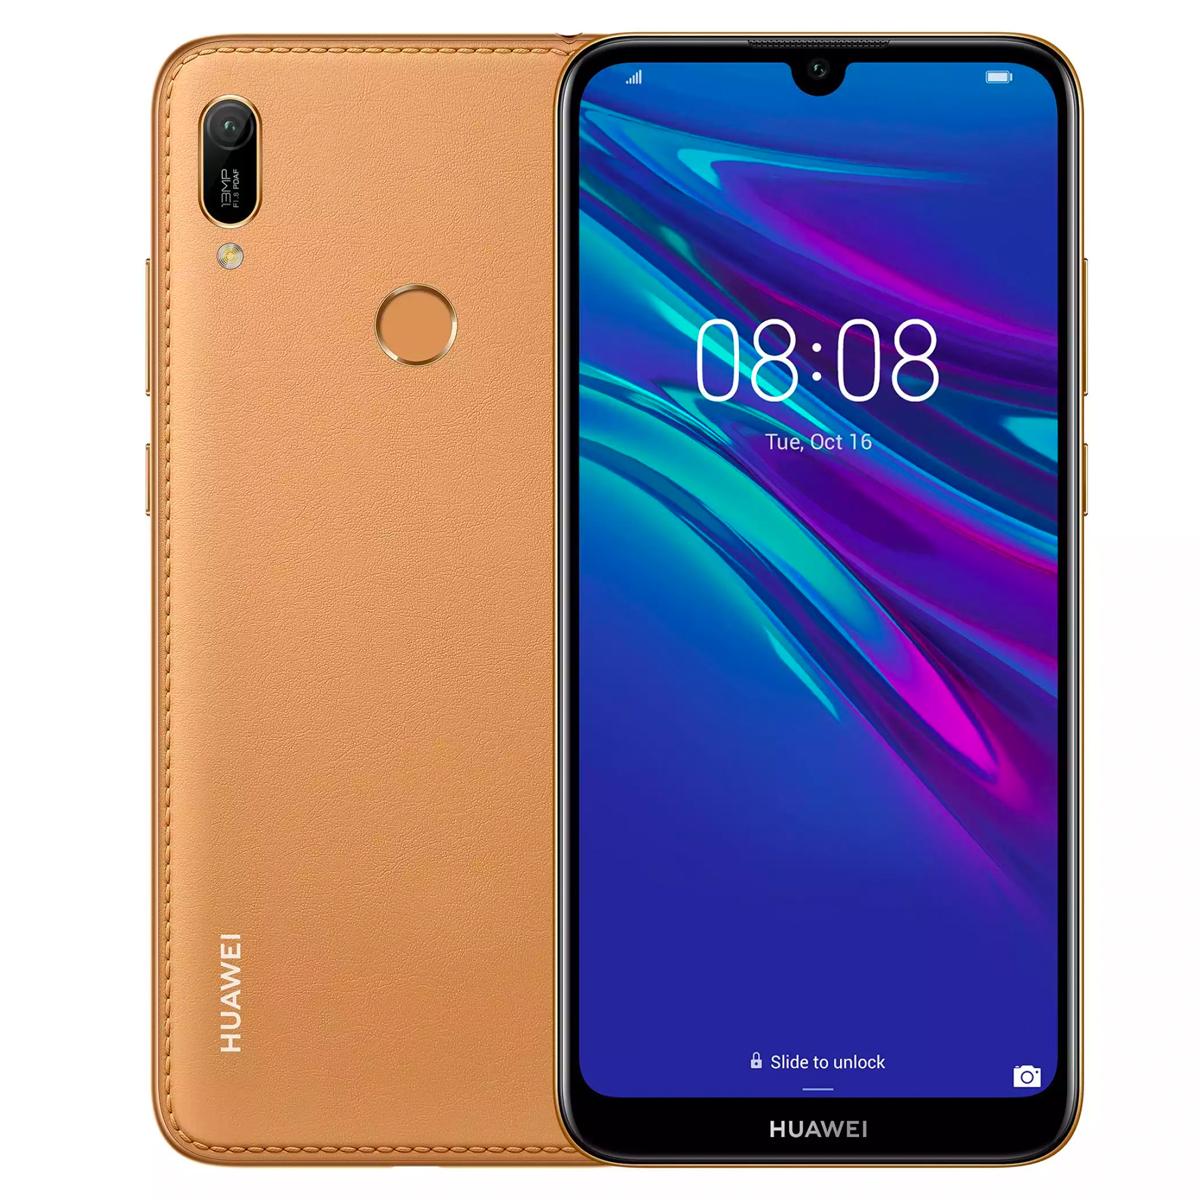 Huawei Y6 Prime (2019) Price in Pakistan 2020 | PriceOye